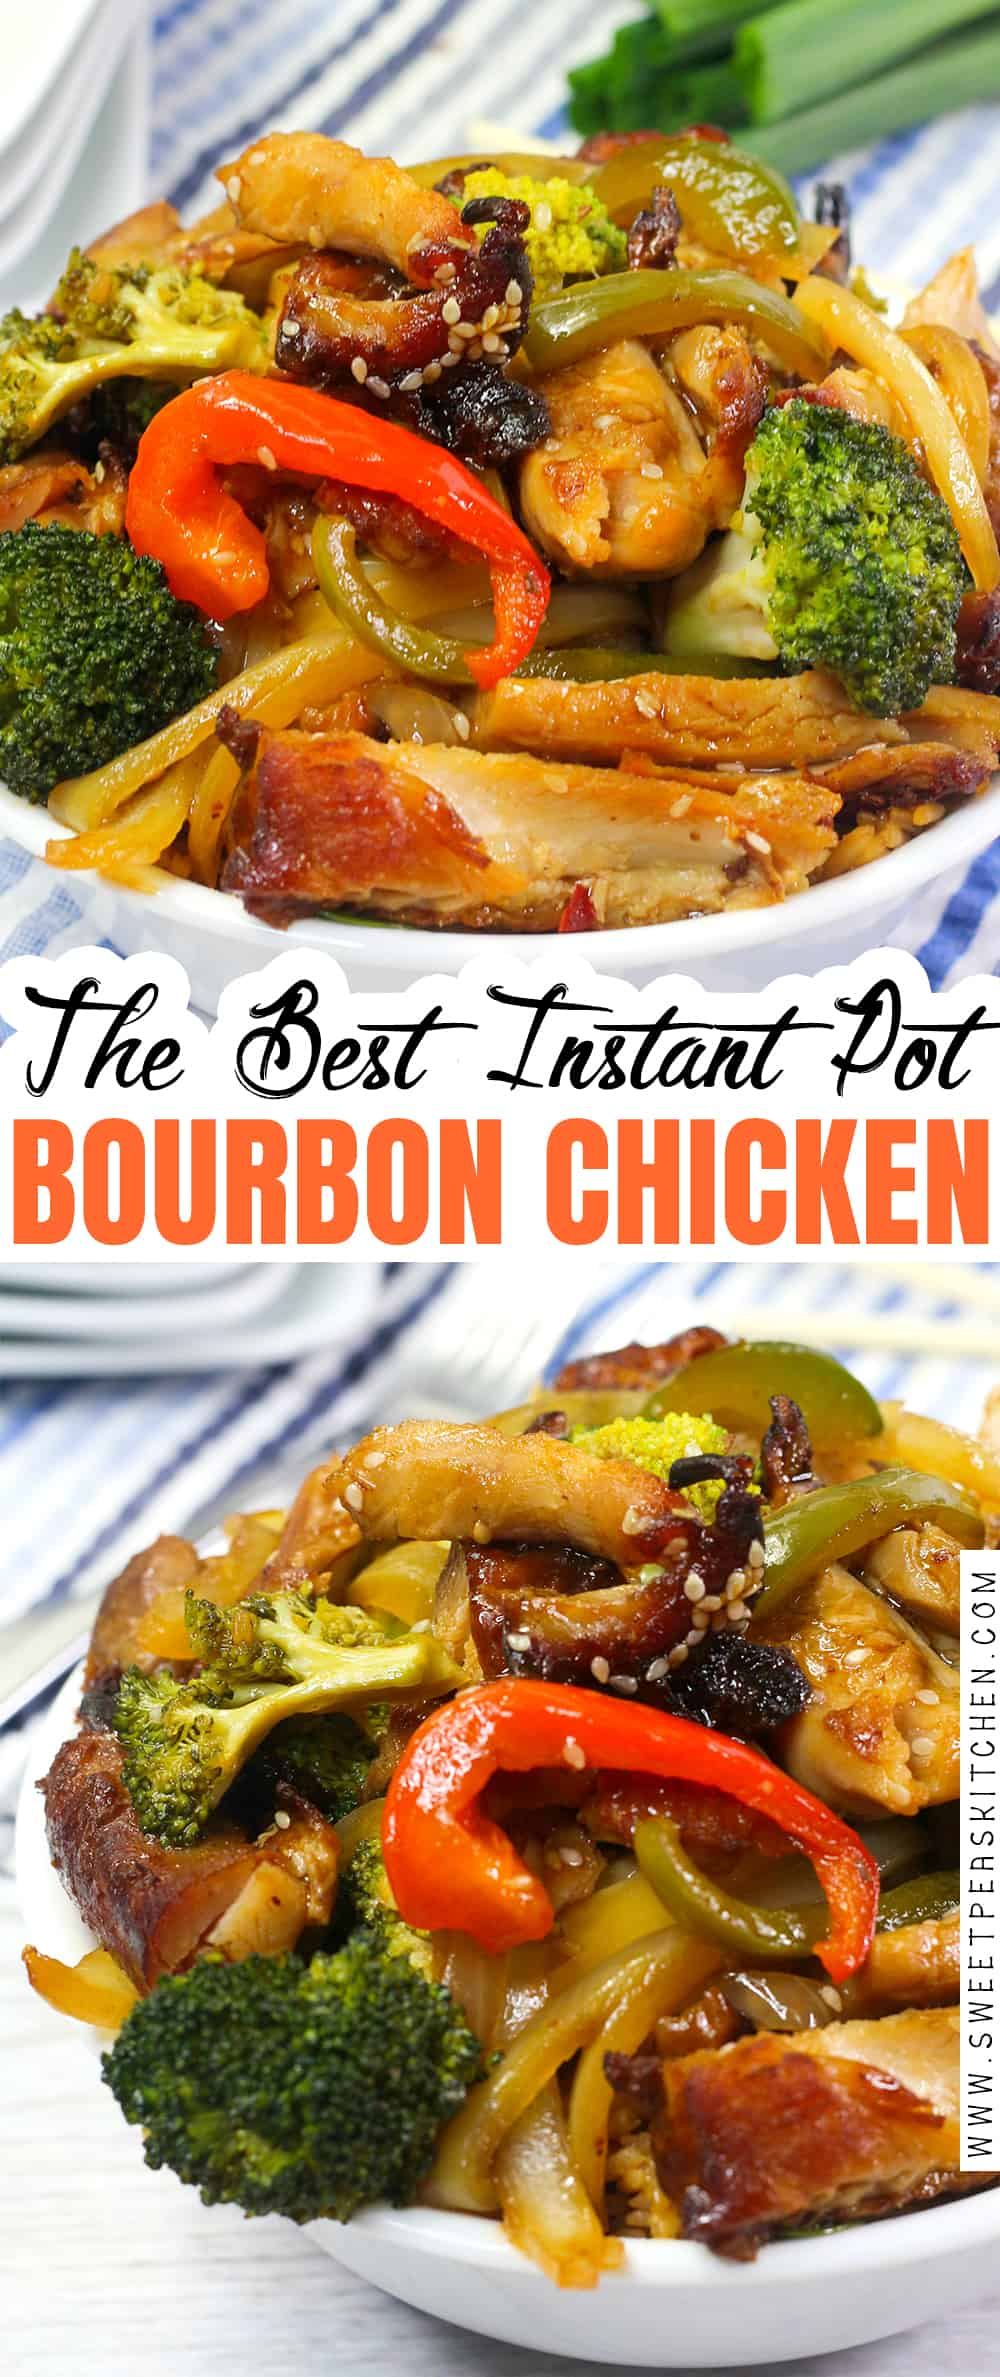 The Best Instant Pot Bourbon Chicken Recipe